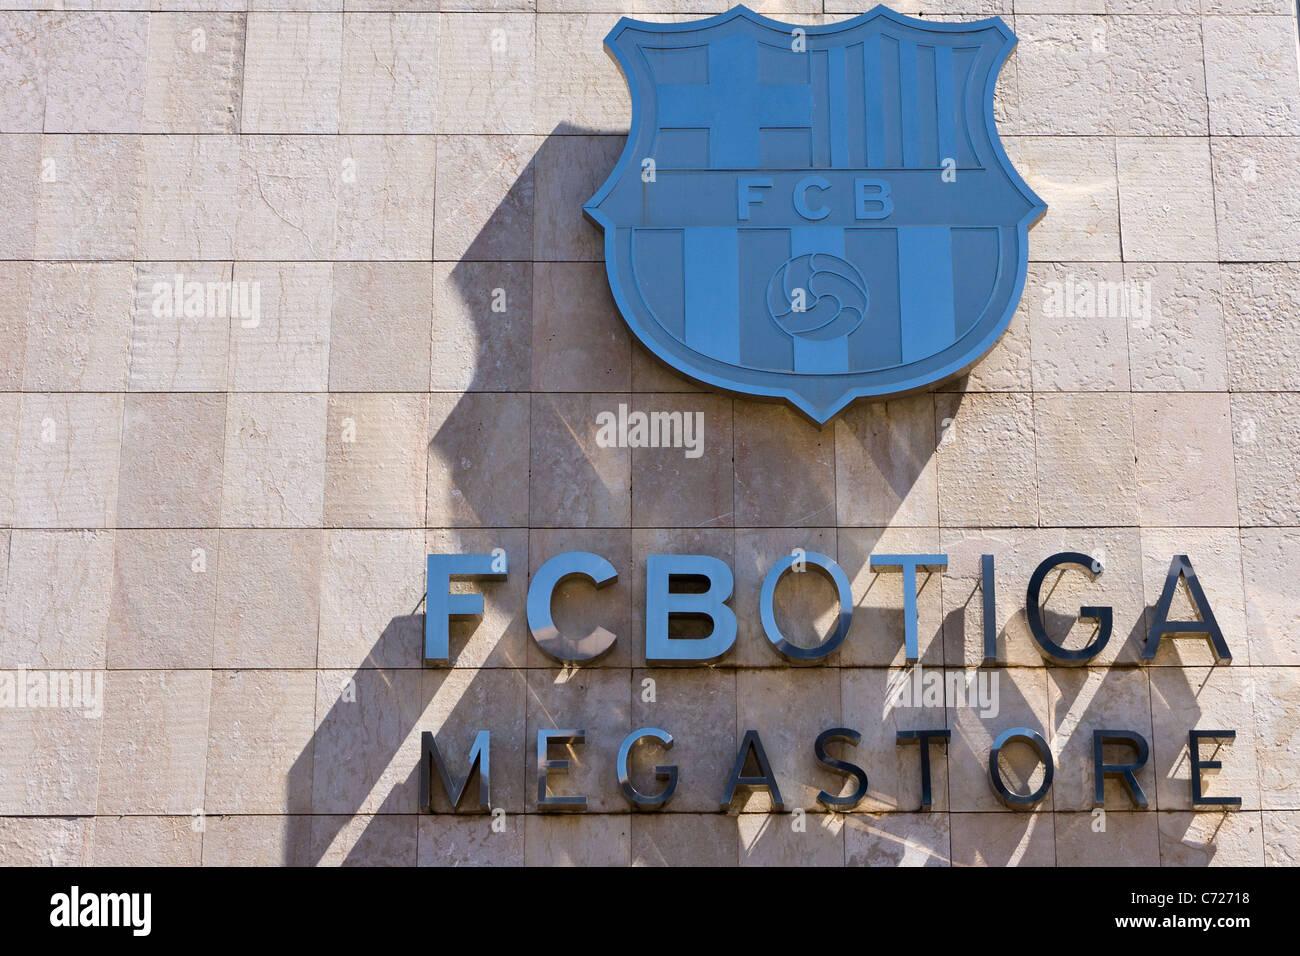 FC Barcelona club store logo - Stock Image